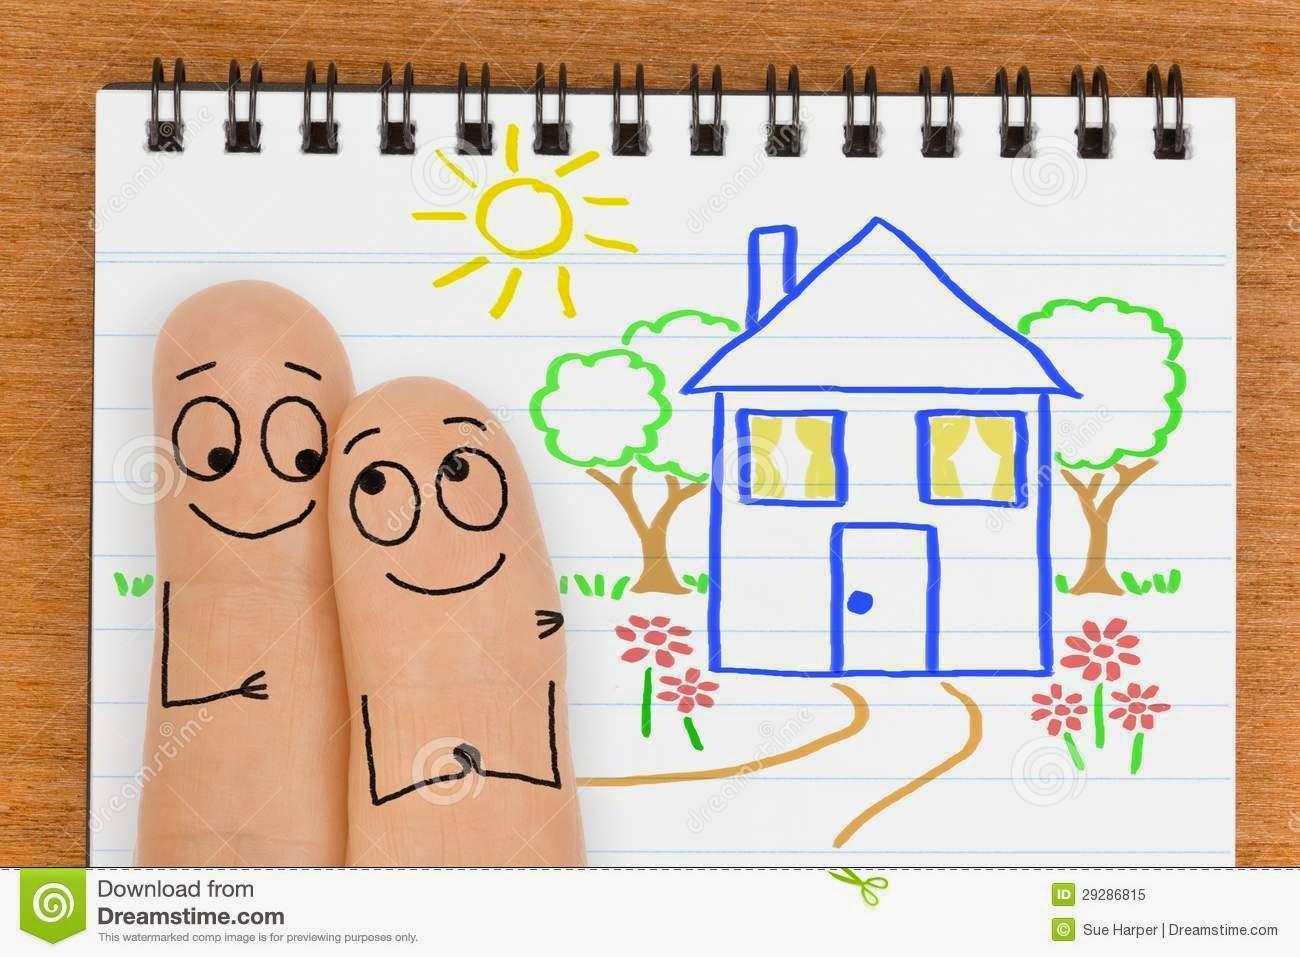 5-pertanyaan-yang-harus-anda-dan-pasangan-Anda-diskusikan-sebelum-memutuskan-untuk-membeli-rumah-minimalis